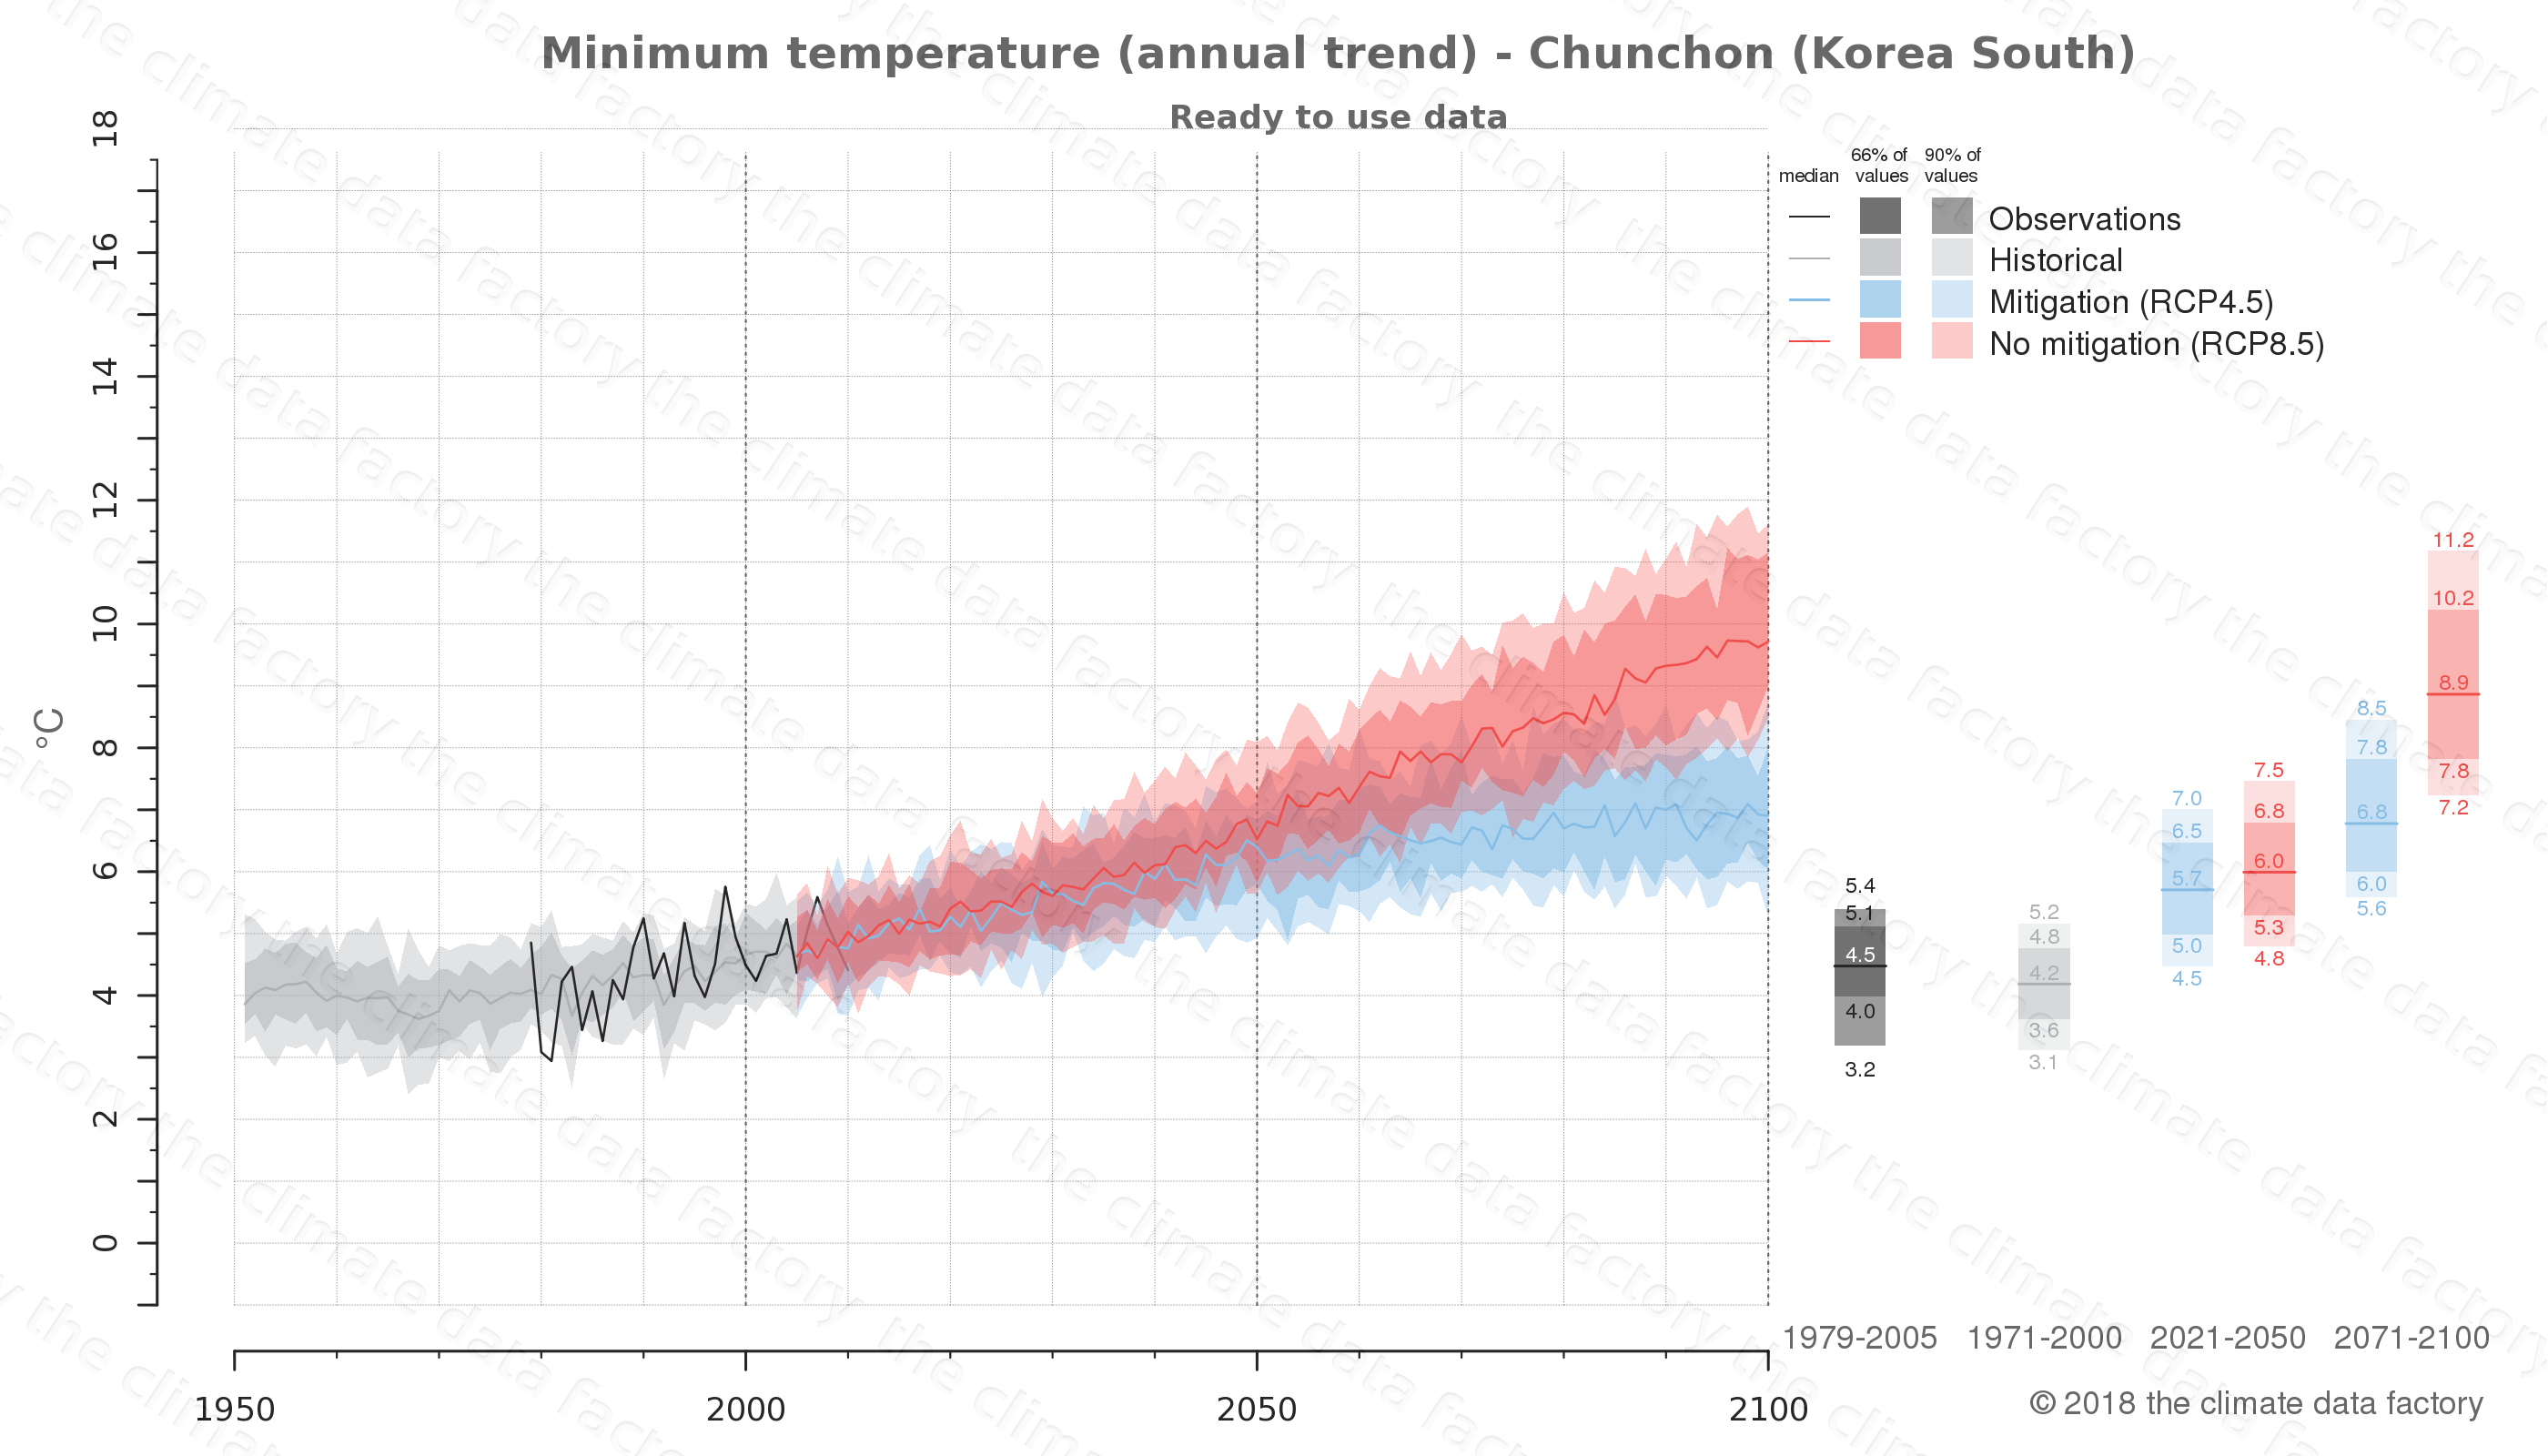 climate change data policy adaptation climate graph city data minimum-temperature chunchon south korea